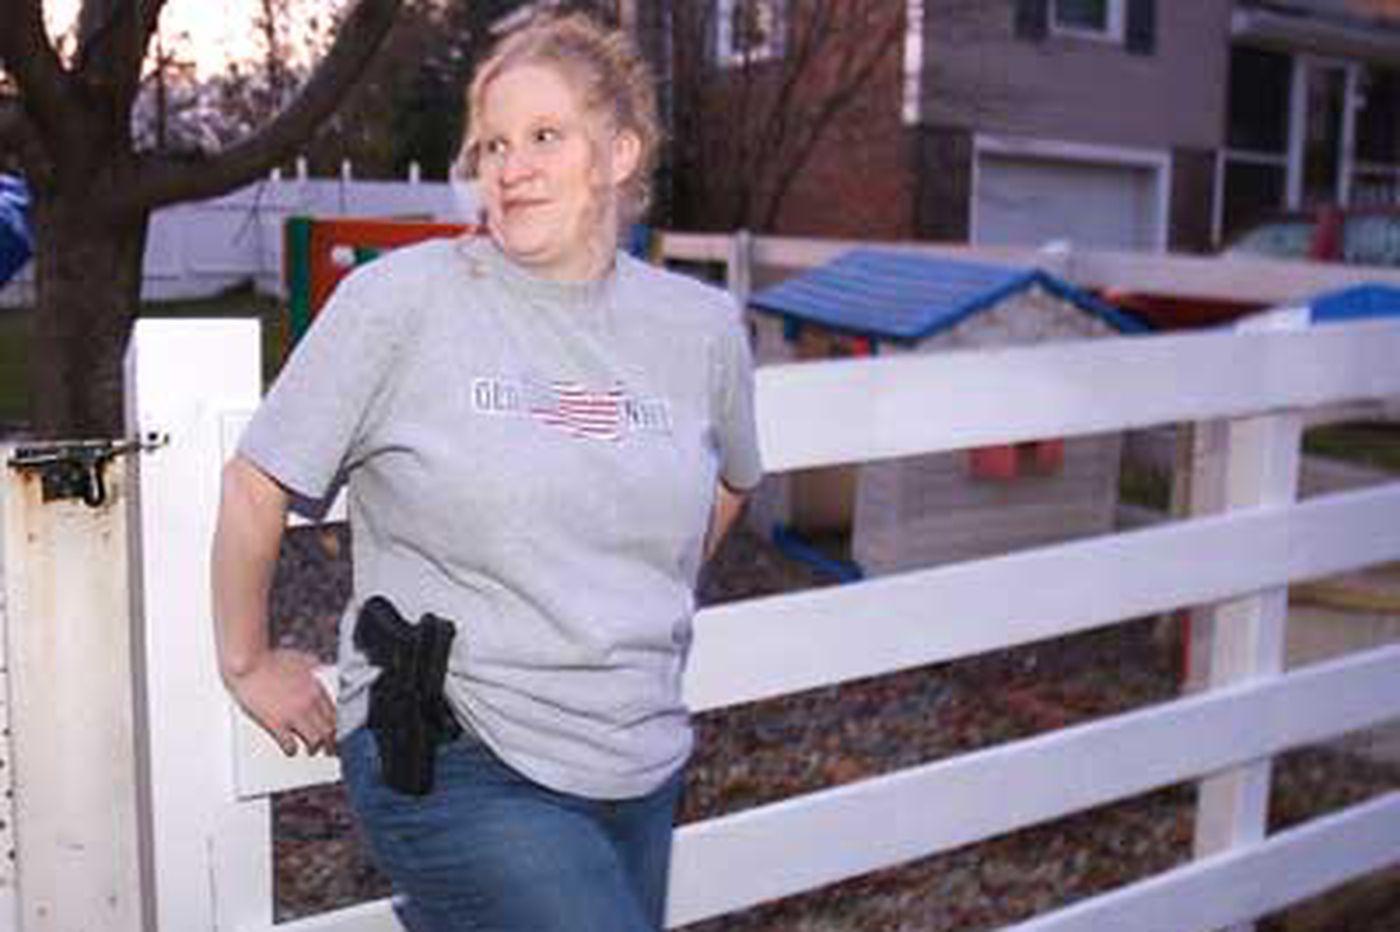 Gun-toting woman divides community